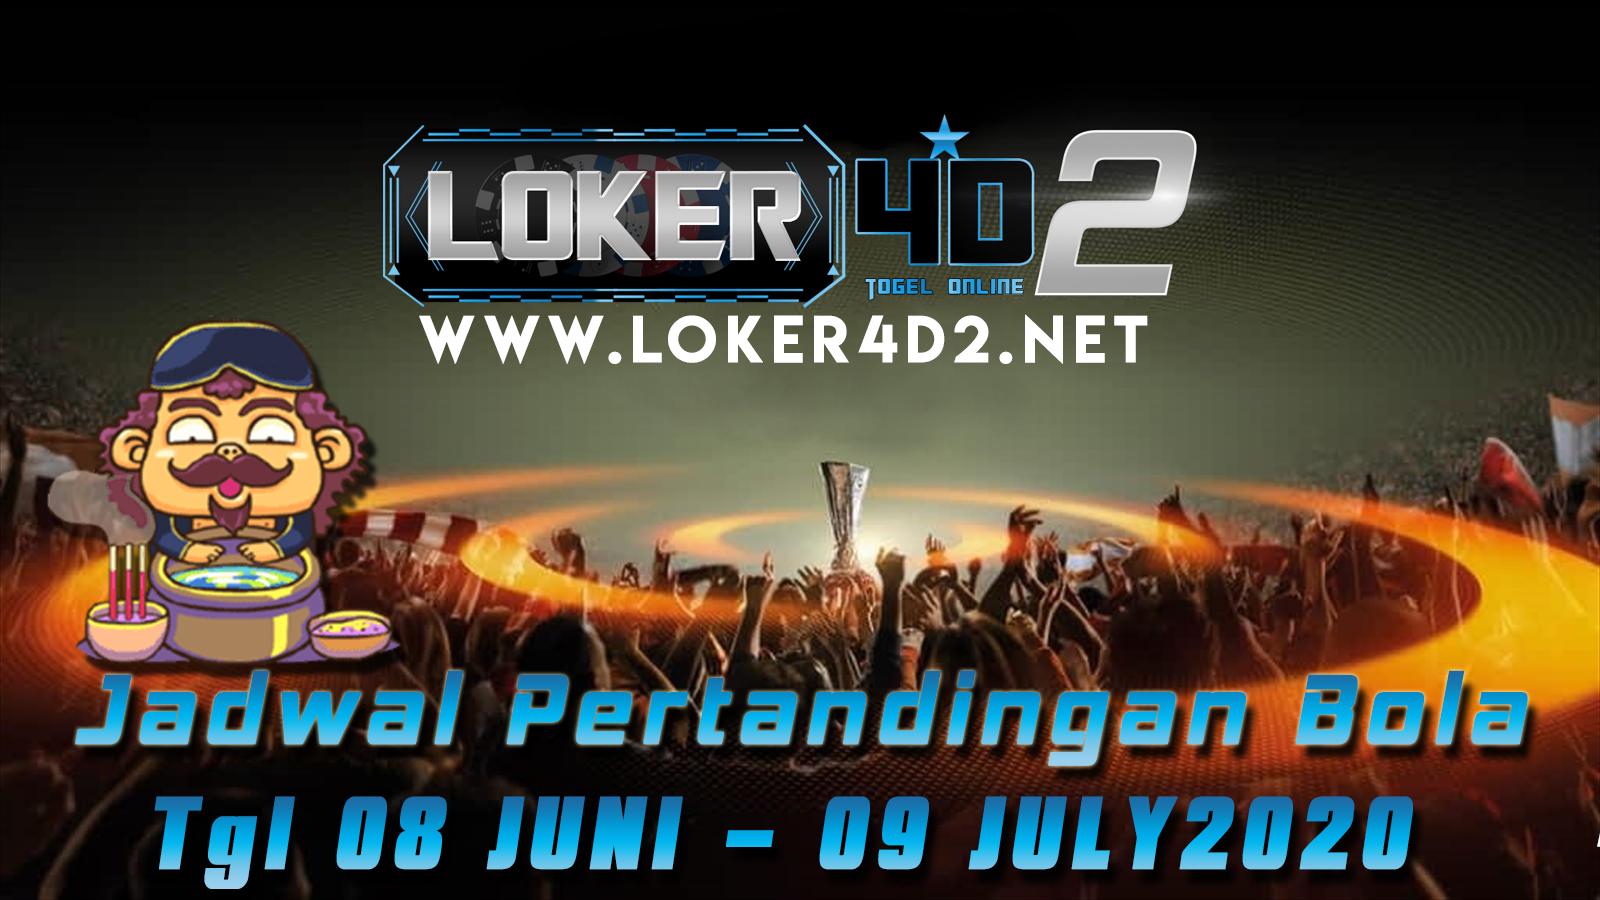 JADWAL PERTANDINGAN BOLA 08-09 JULI 2020